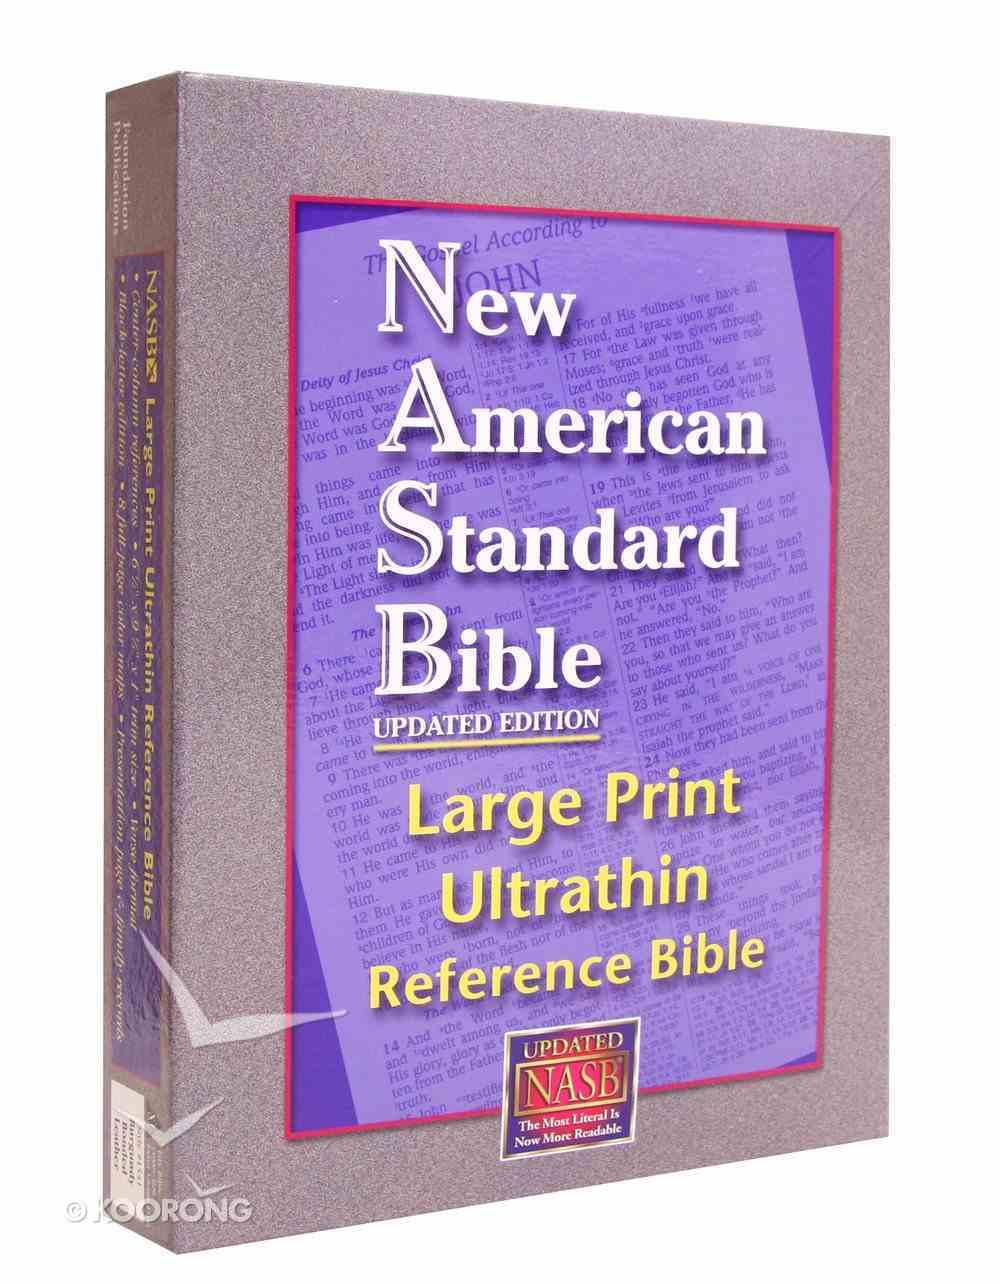 NASB Large Print Ultrathin Reference Bible Burgundy Bonded Leather